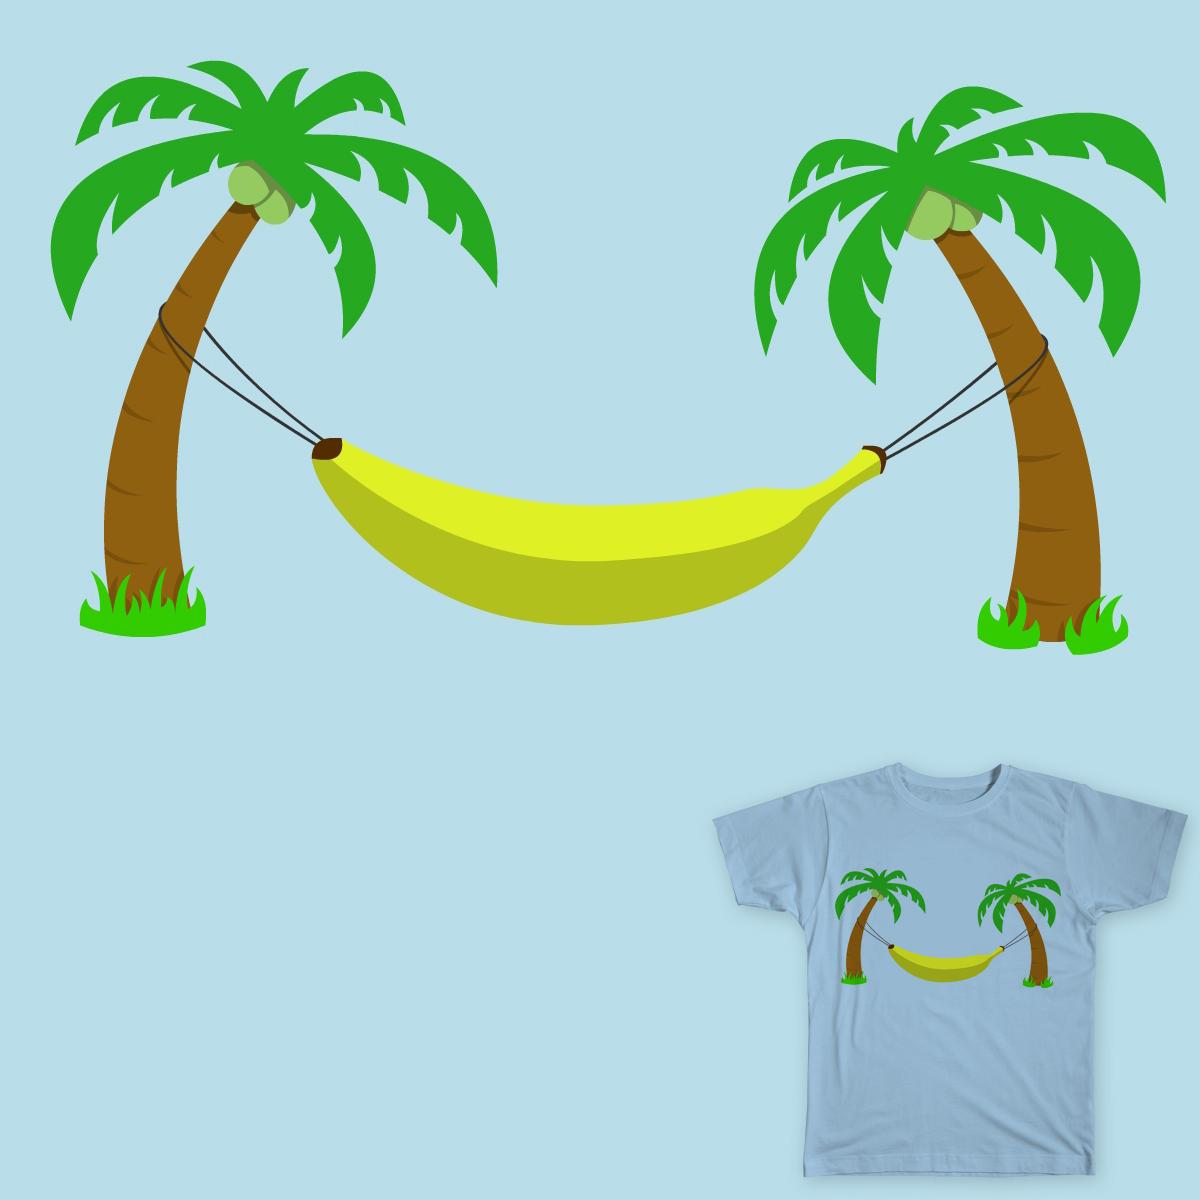 Banana Hammock by MoonShoesPatty on Threadless